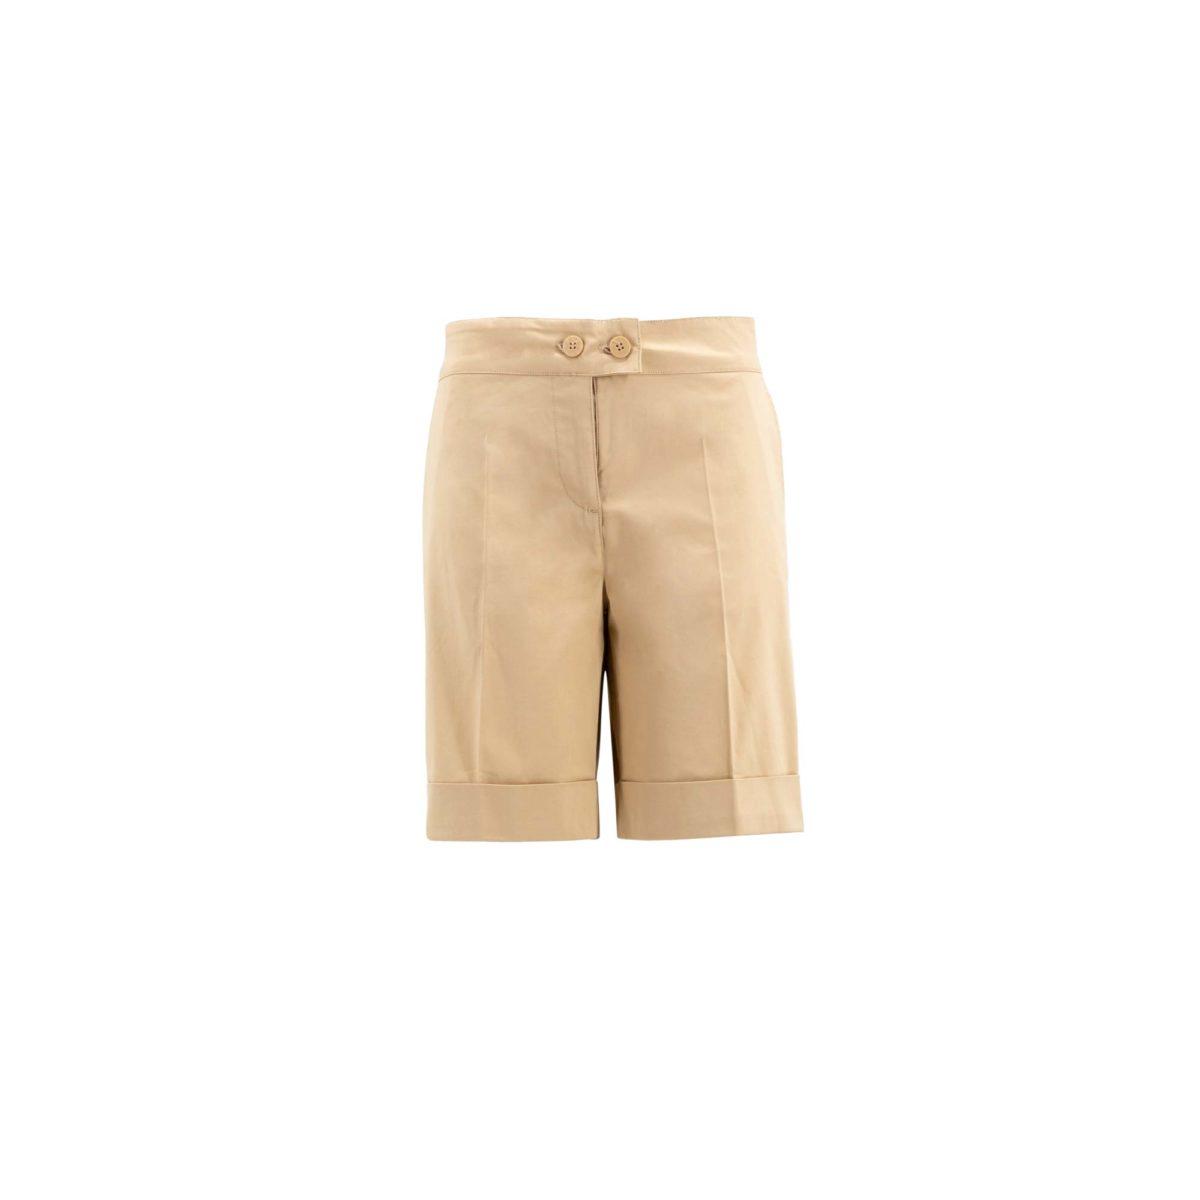 Shorts Bermuda Sabbia - vista frontale   Nicla